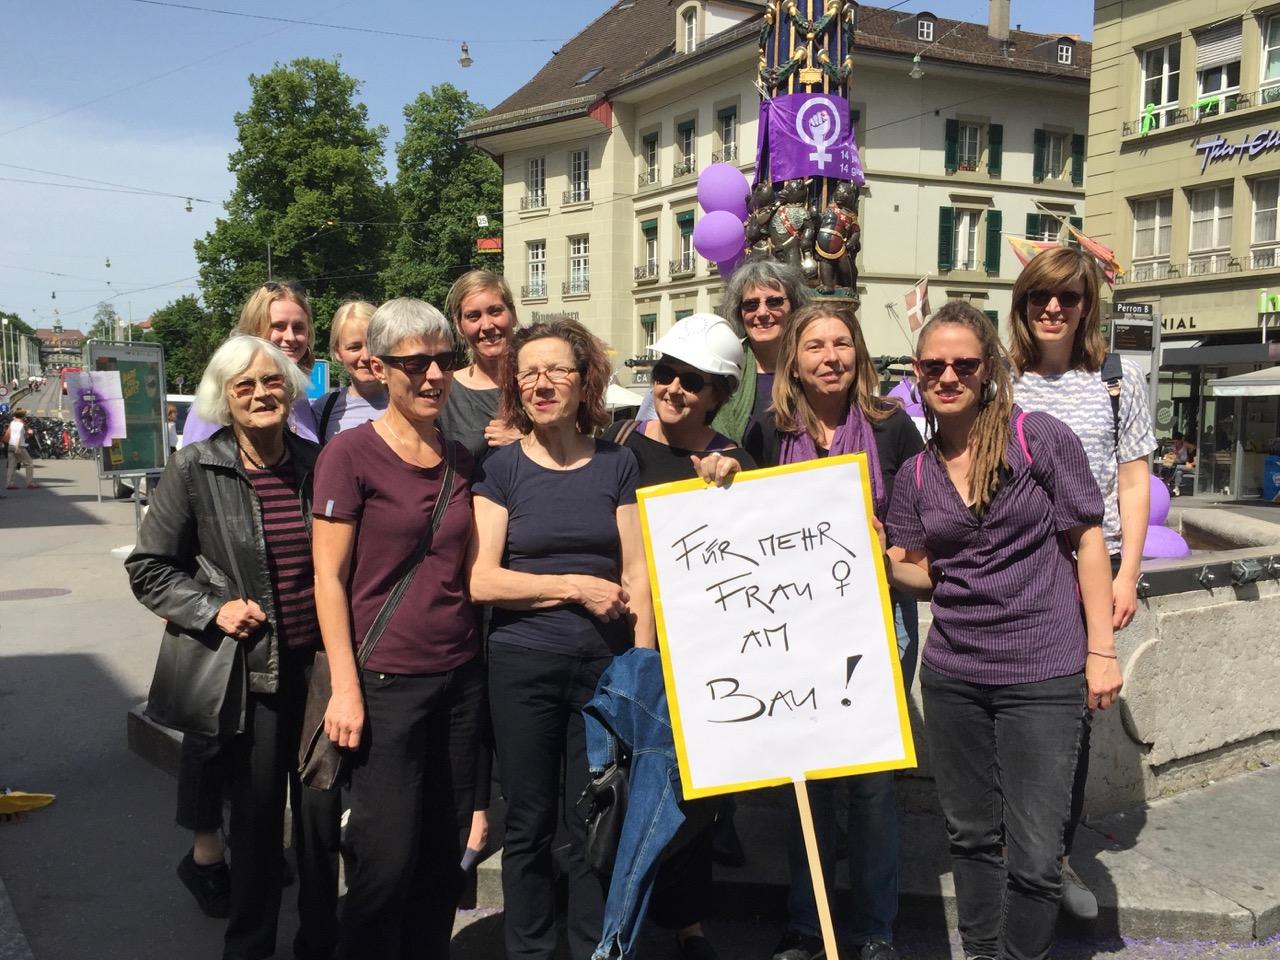 ABAP am Frauenstreik 14.6.19 - 1